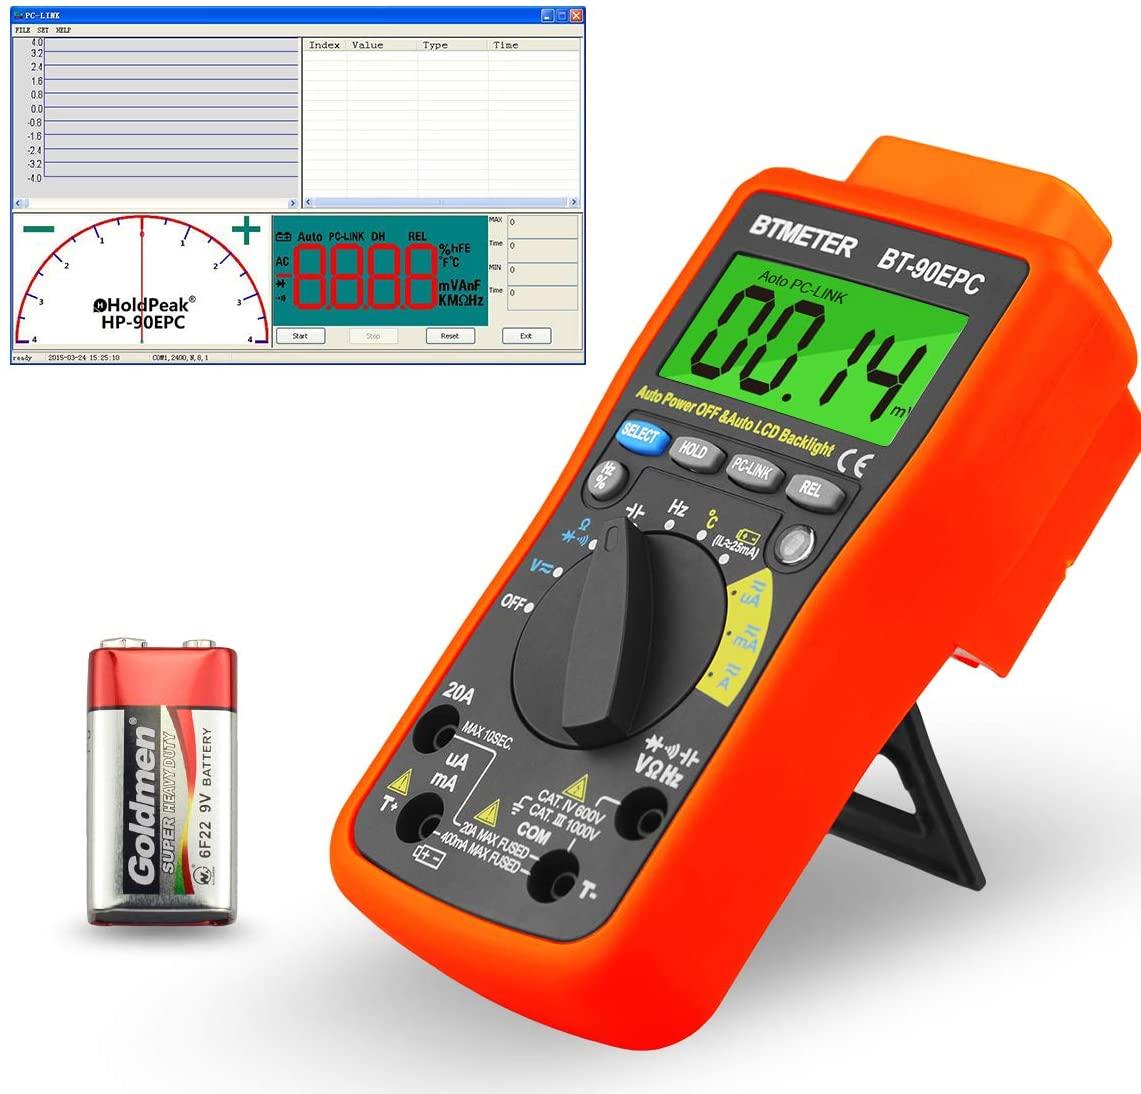 Data Logging Digital Multimeter, BTMETER BT-90EPC Auto-Ranging AC/DC Volt Amp Ohm Temperature Electric Multi-tester Sync to Computer via USB